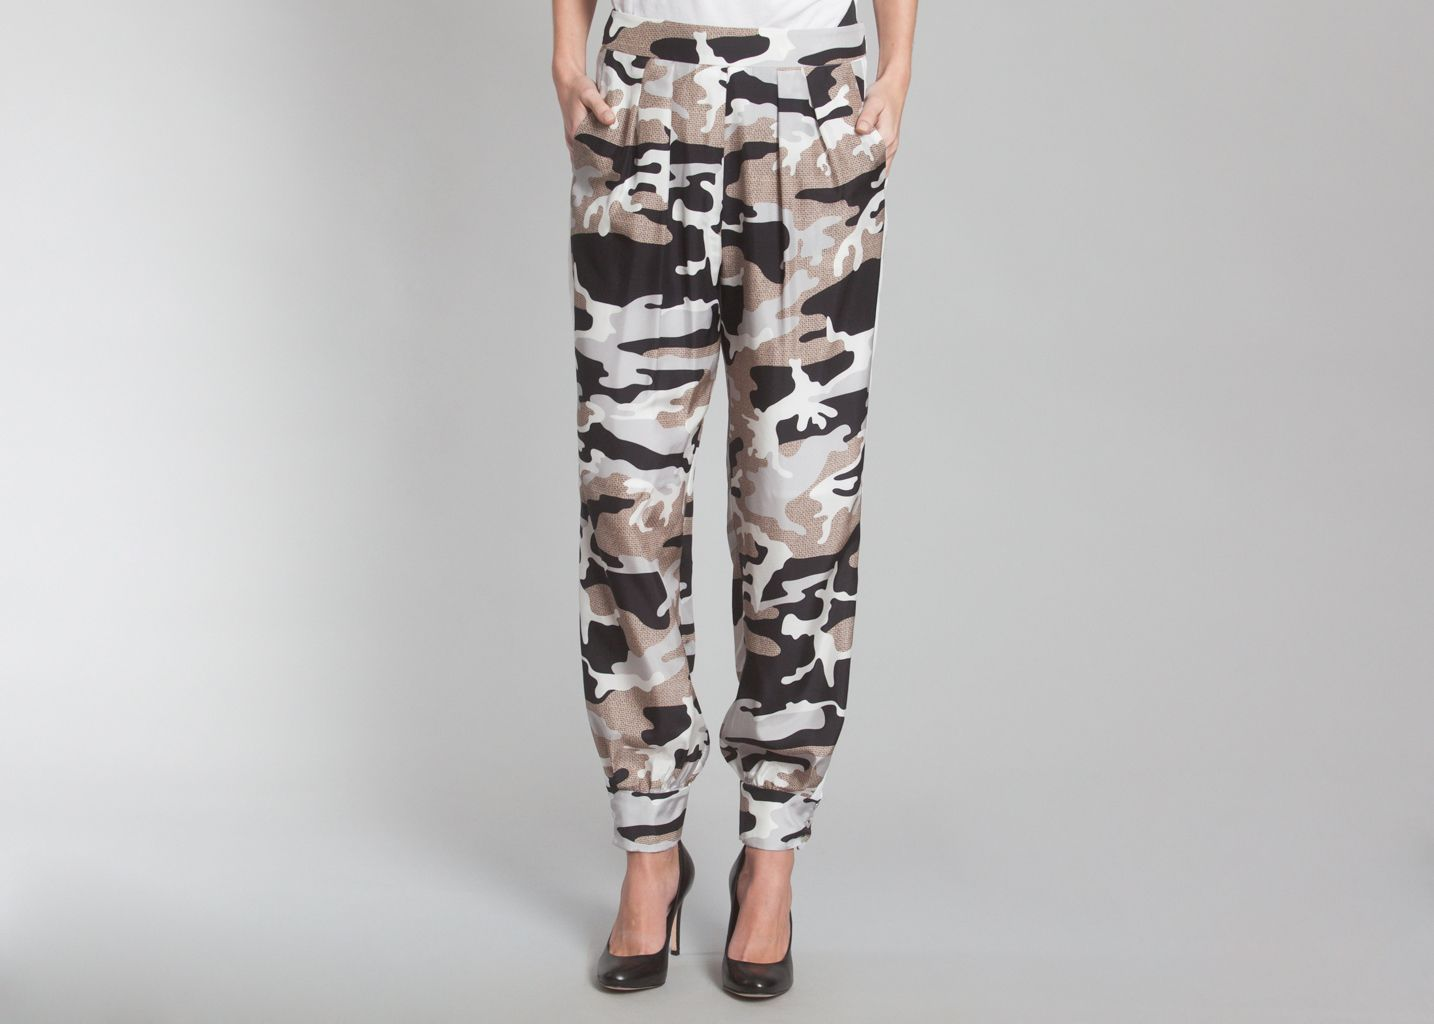 Pantalon Camouflage - JC de Castelbajac